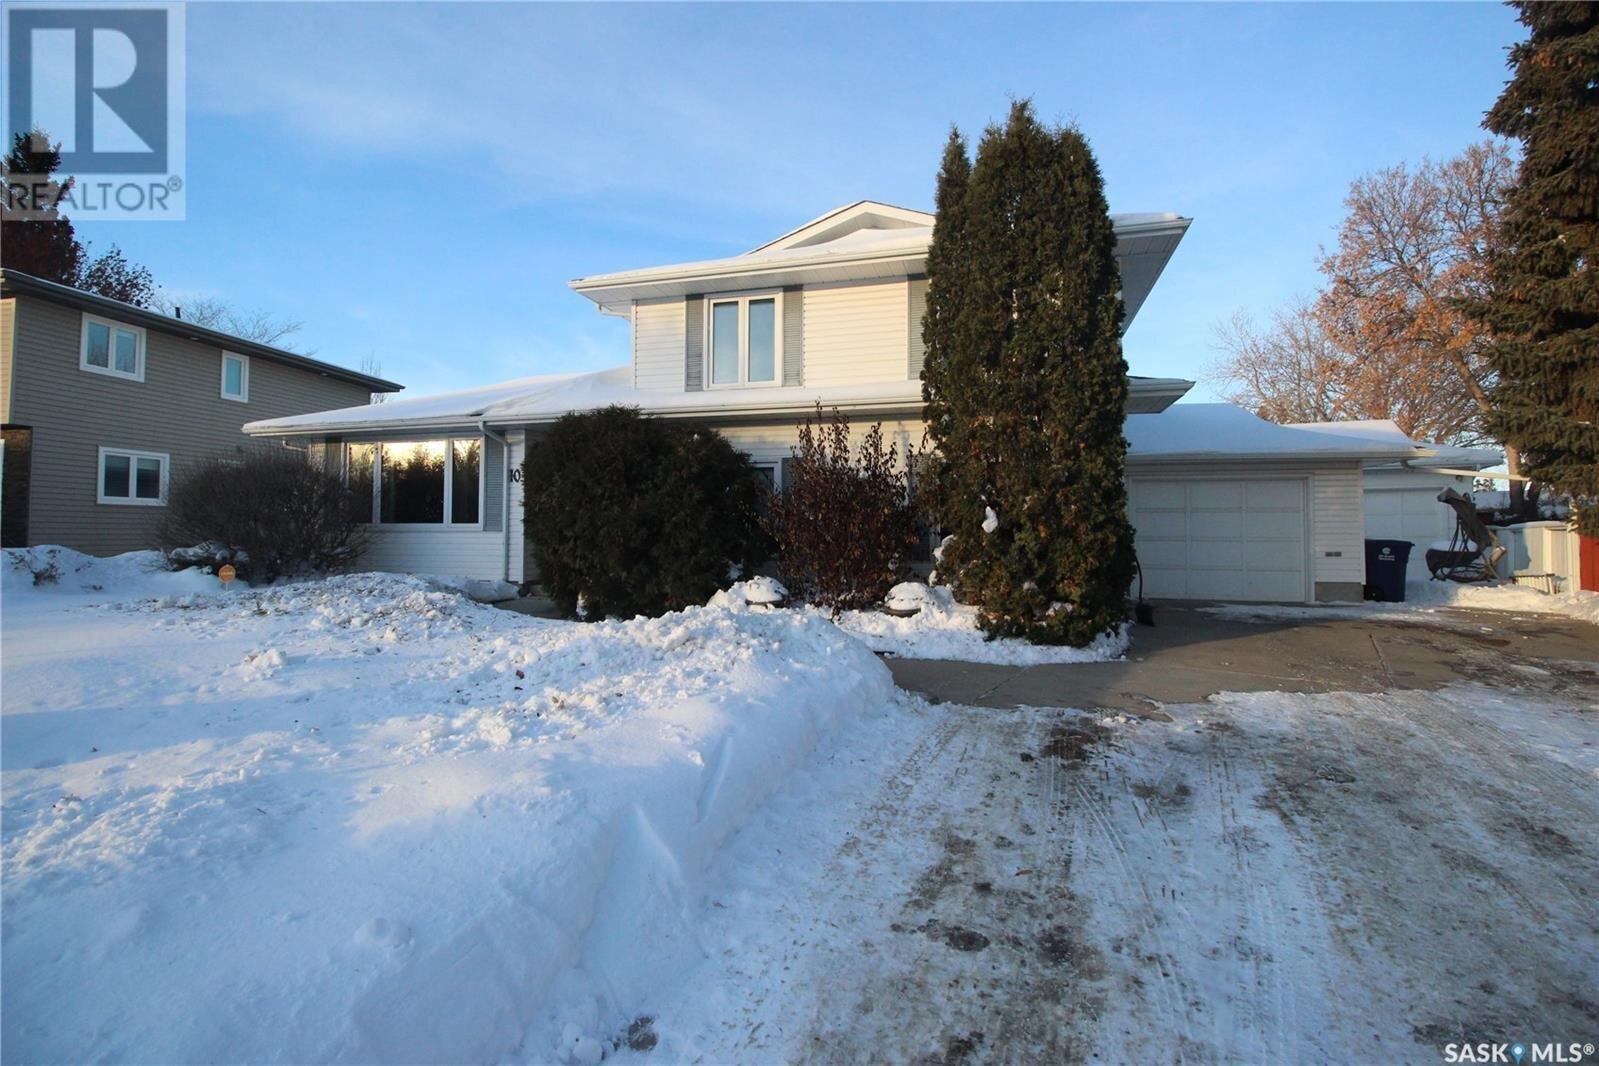 House for sale at 10 Harrington Pl Saskatoon Saskatchewan - MLS: SK834663